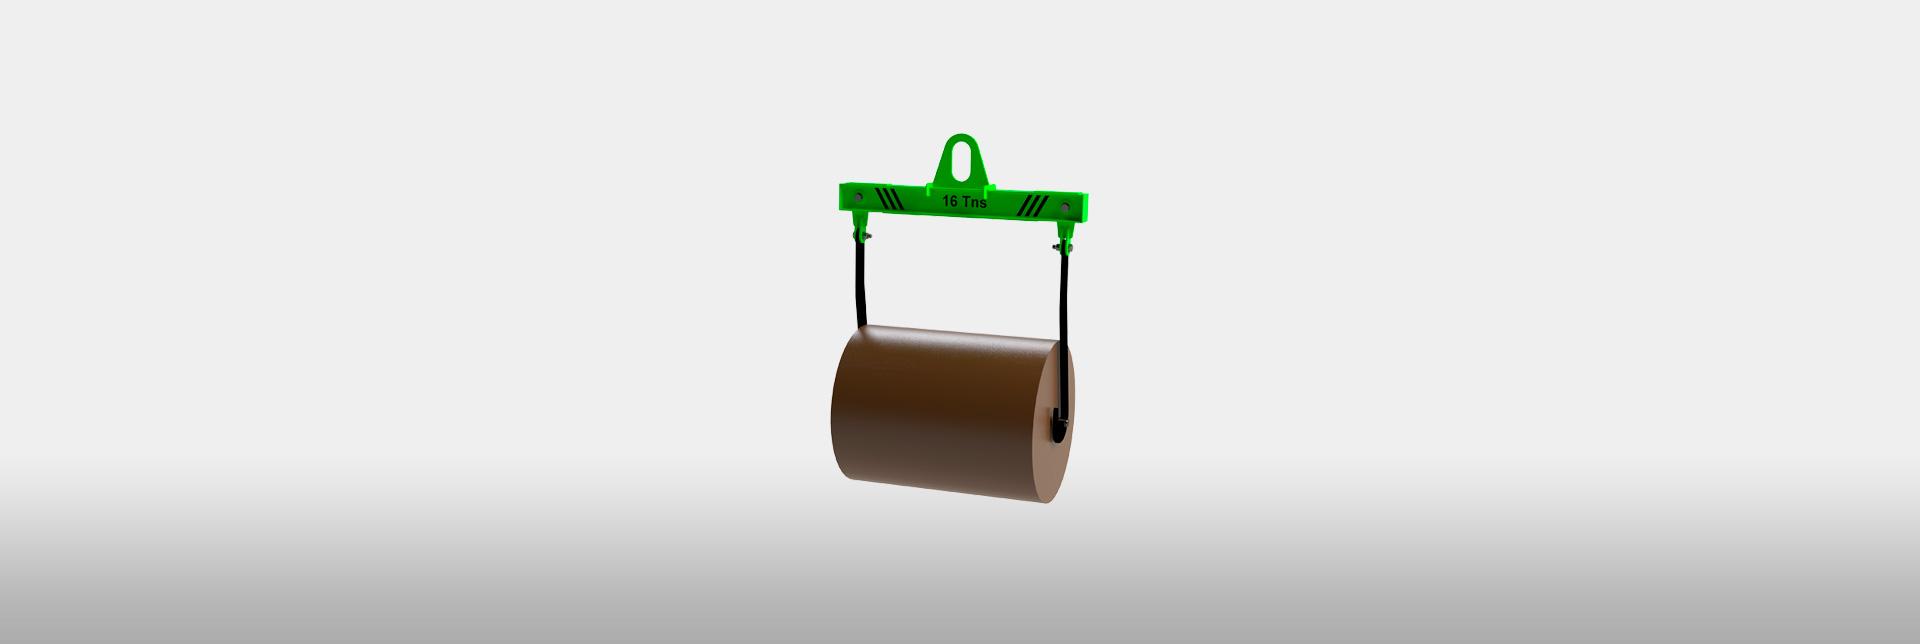 Slide1-balancin-cargaseje